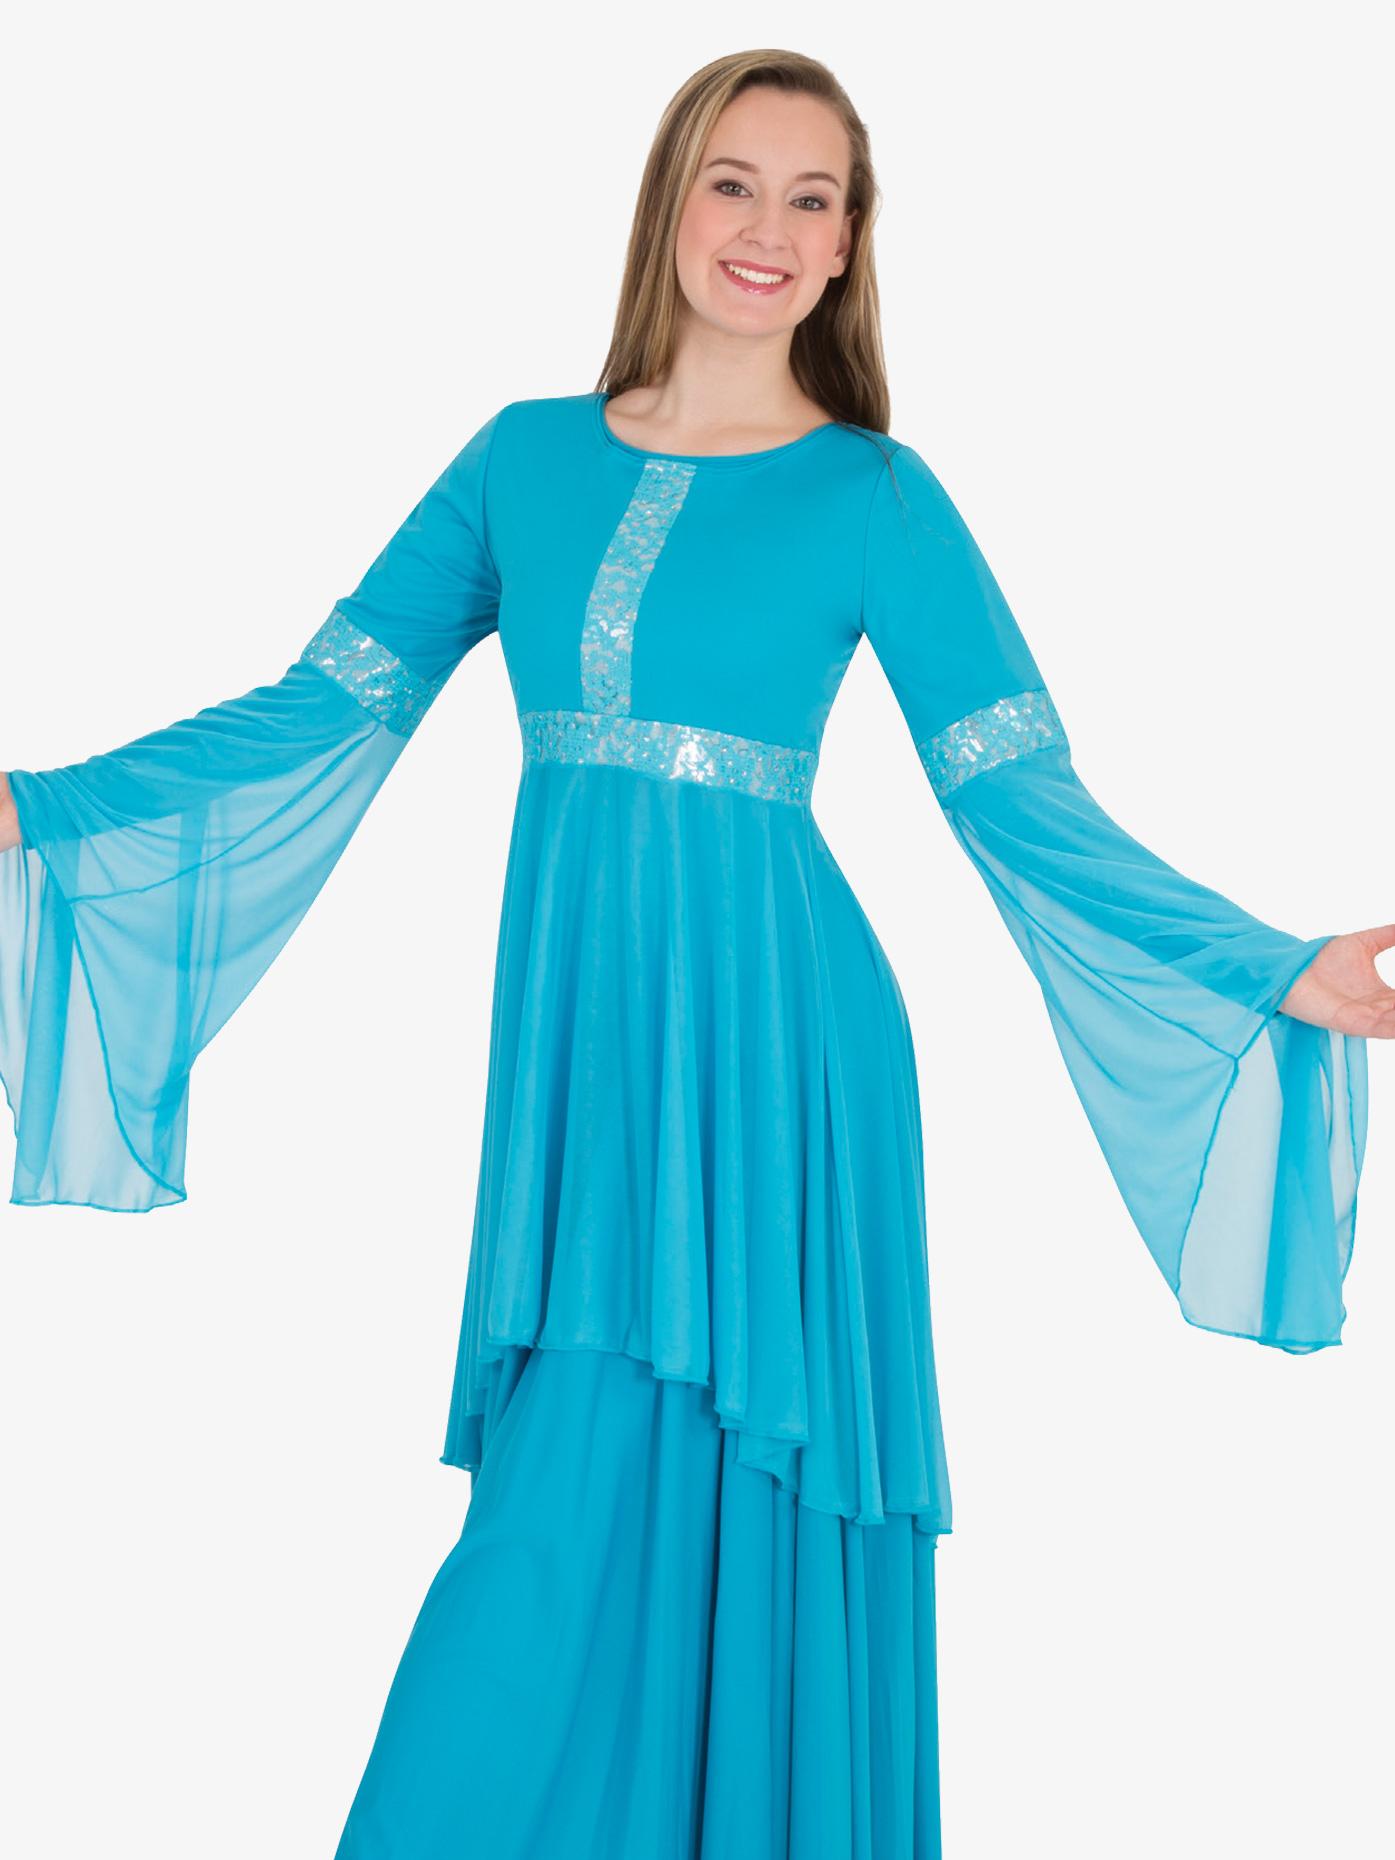 Body Wrappers Womens Lace Insert Drapey Metallic Worship Tunic BW622